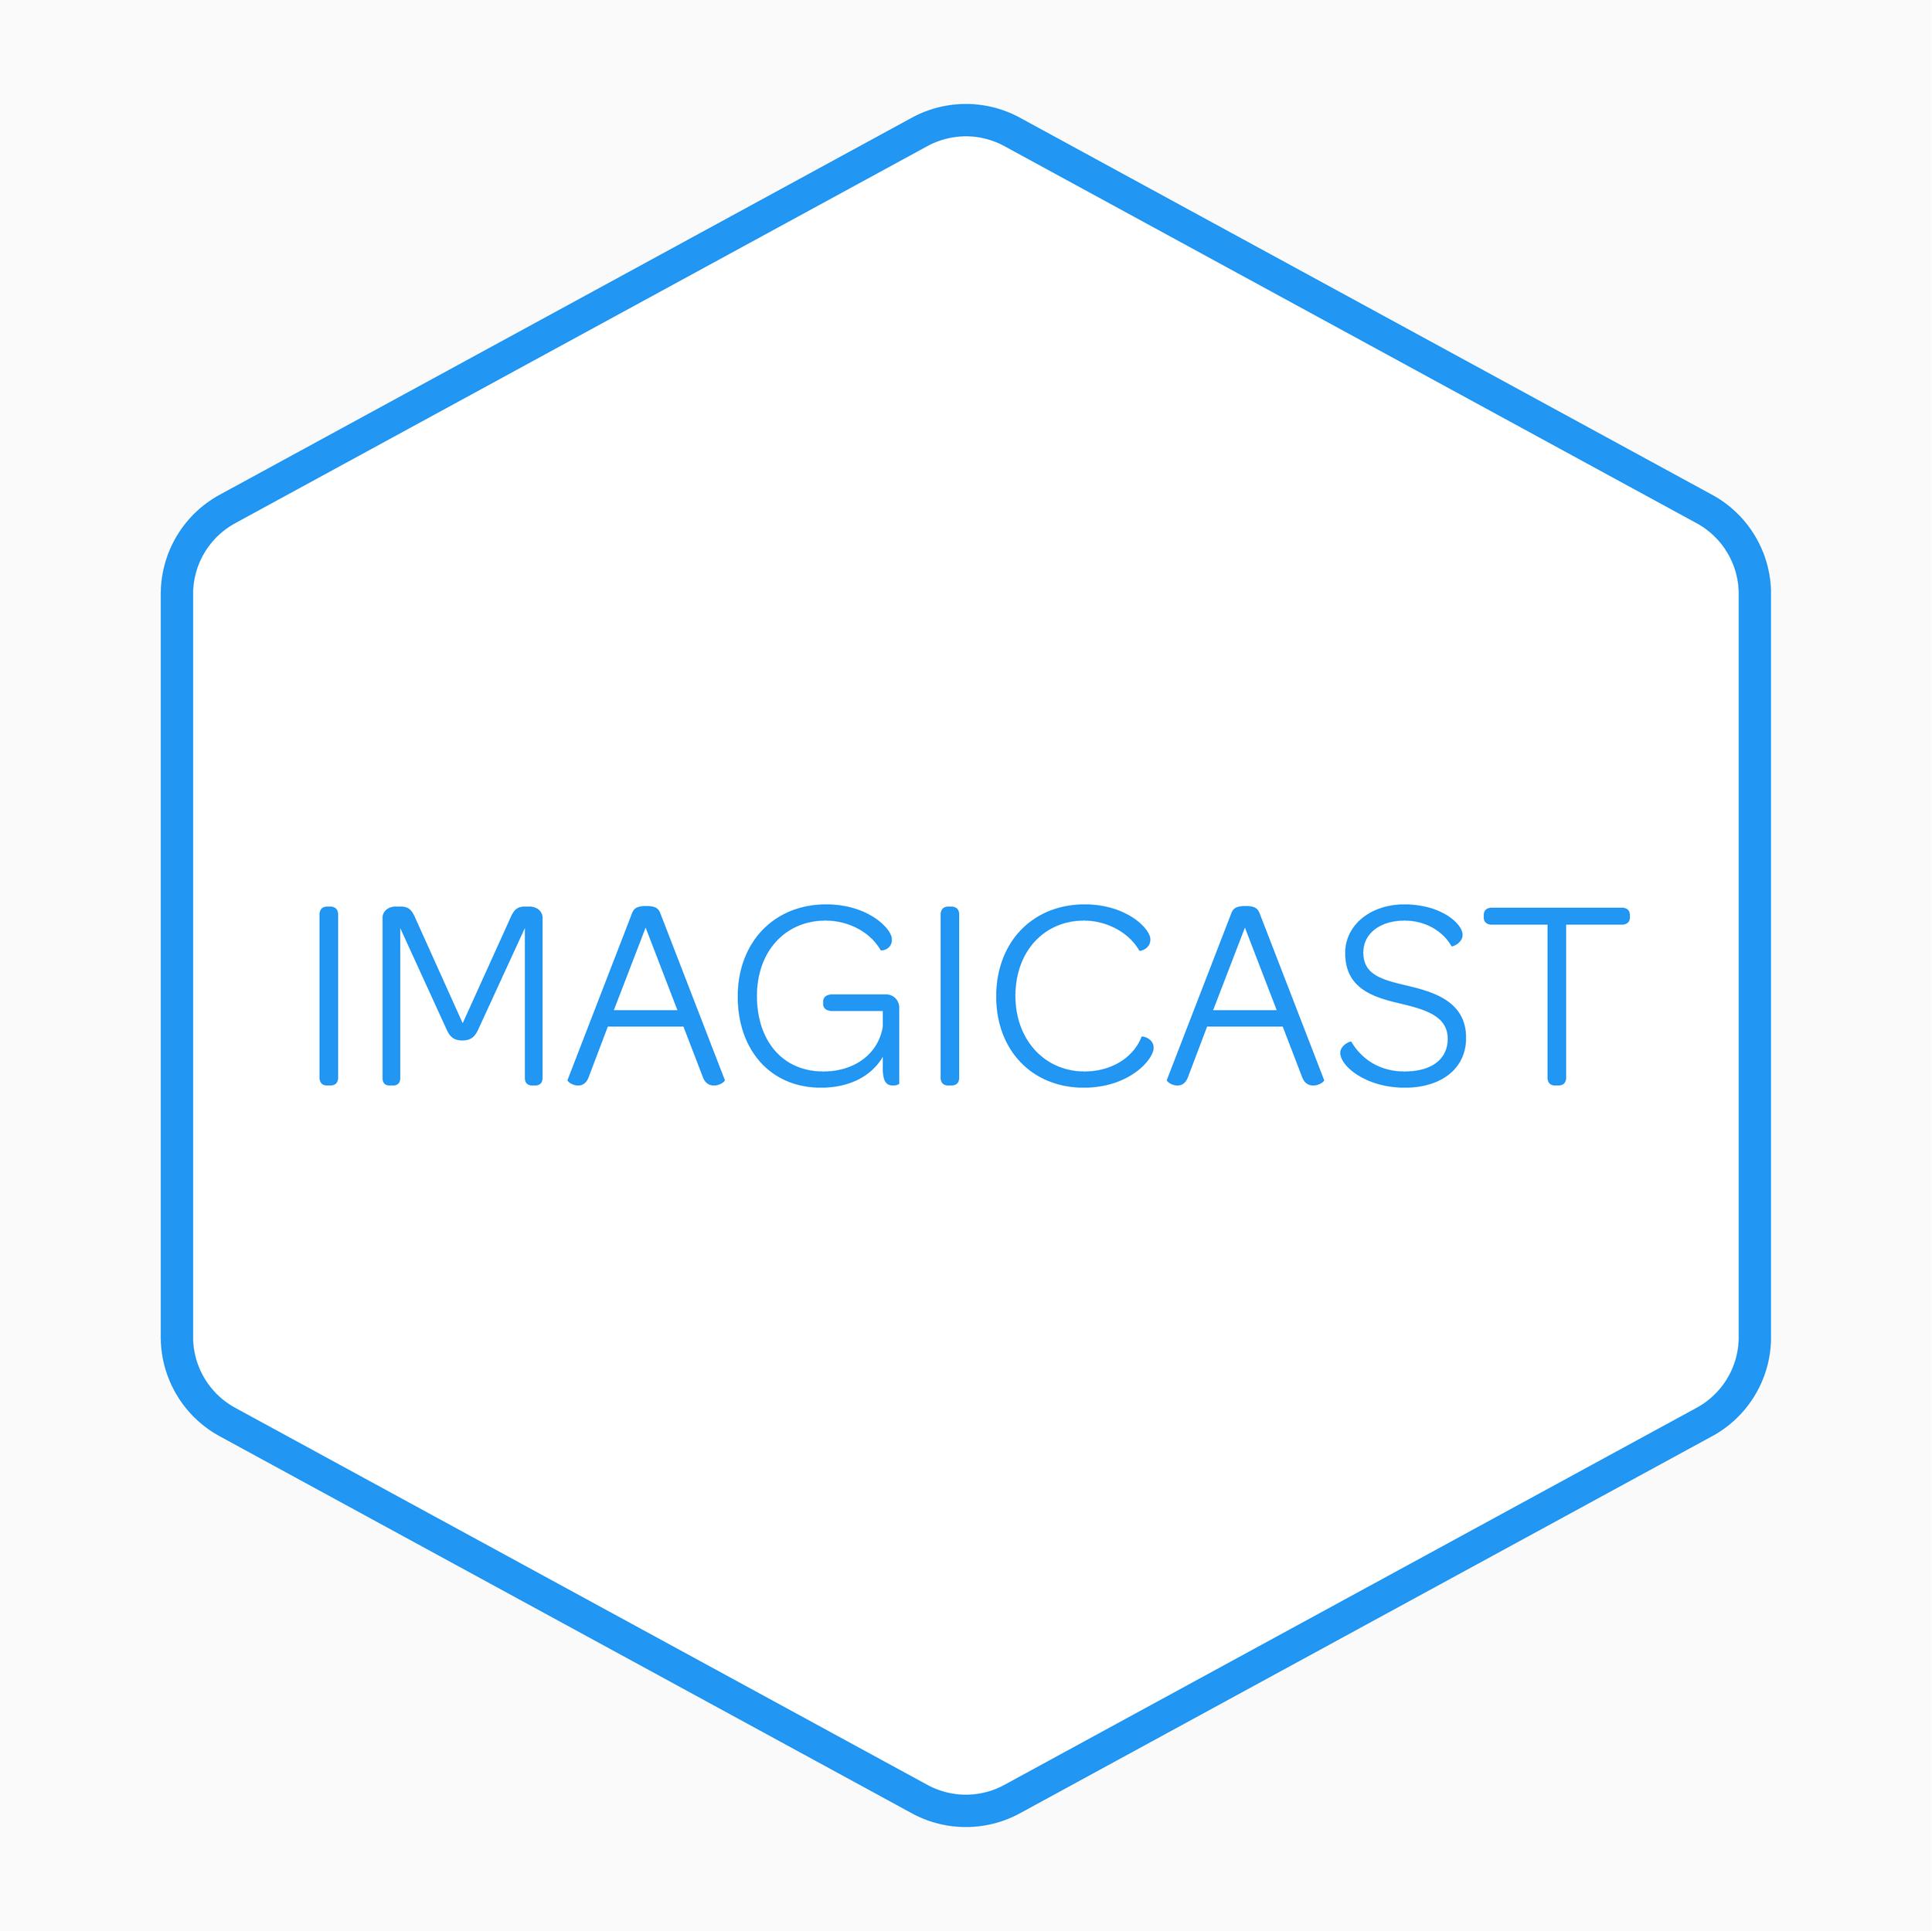 imagicast logo website.png